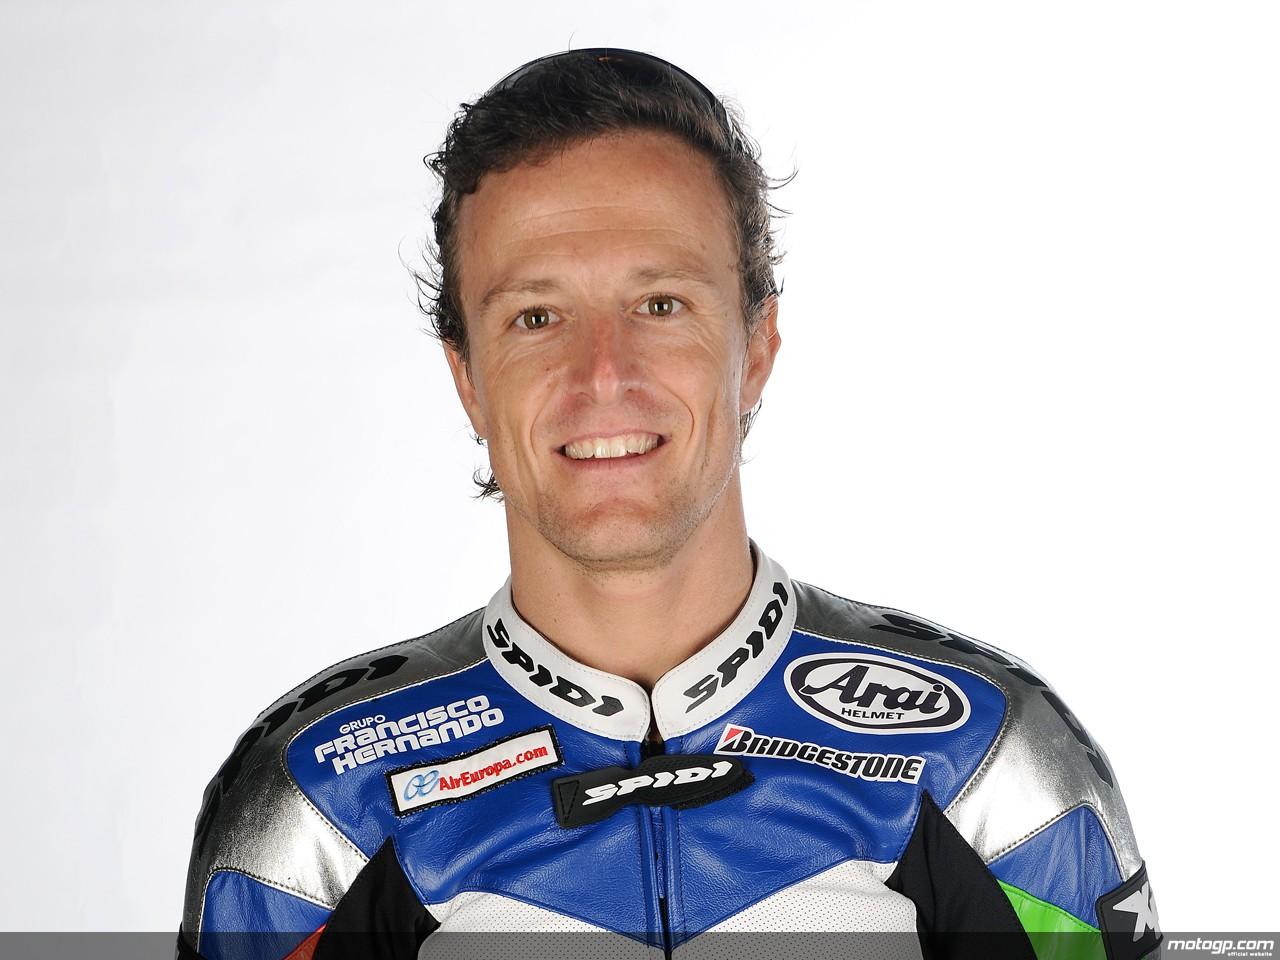 Grupo Francisco Hernando Rider